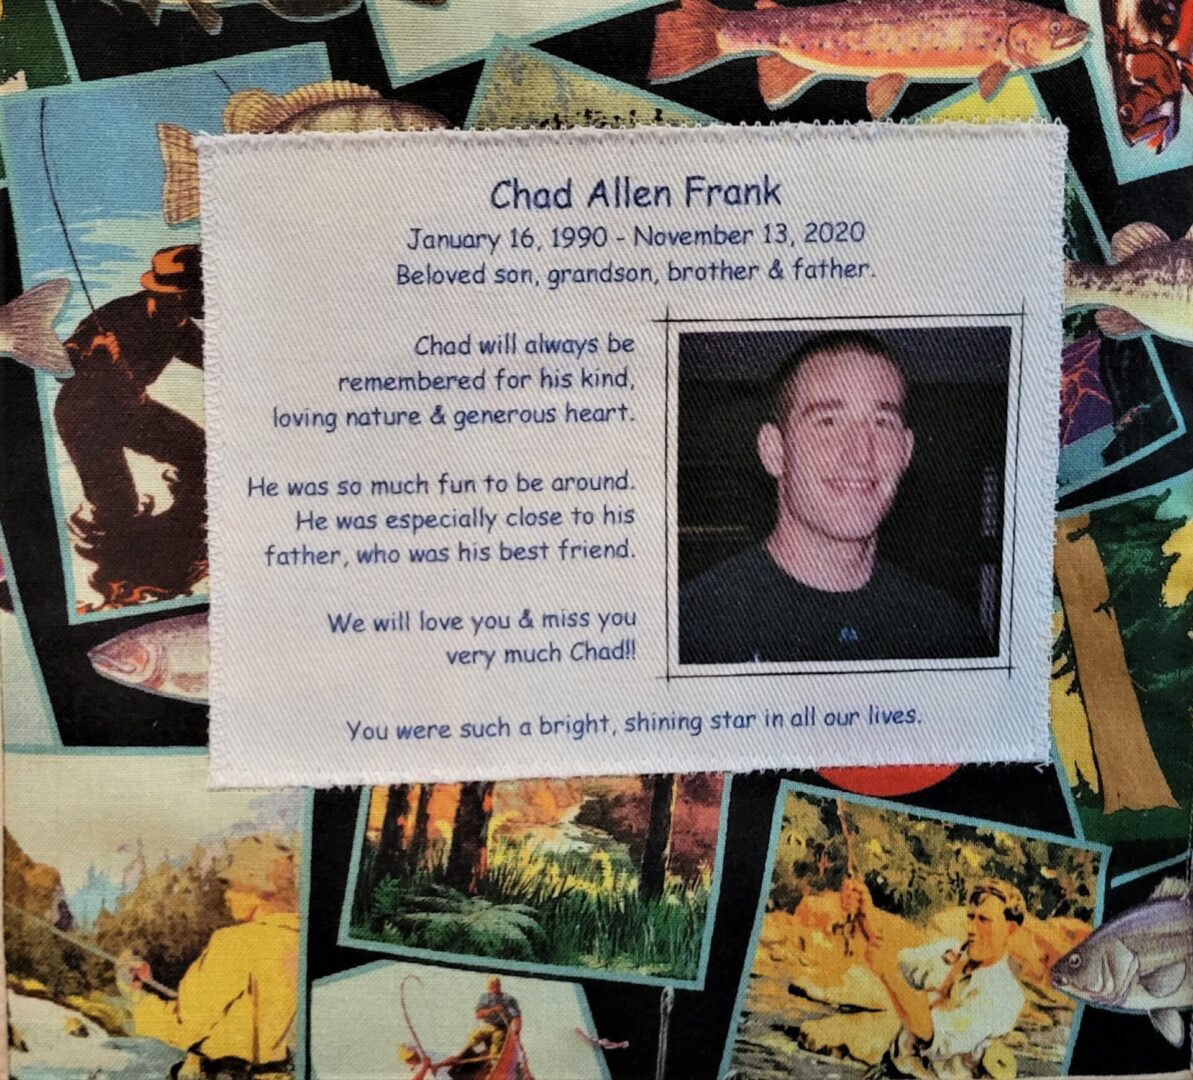 IN MEMORY OF CHAD ALLEN FRANK - NOVEMBER 13, 2020